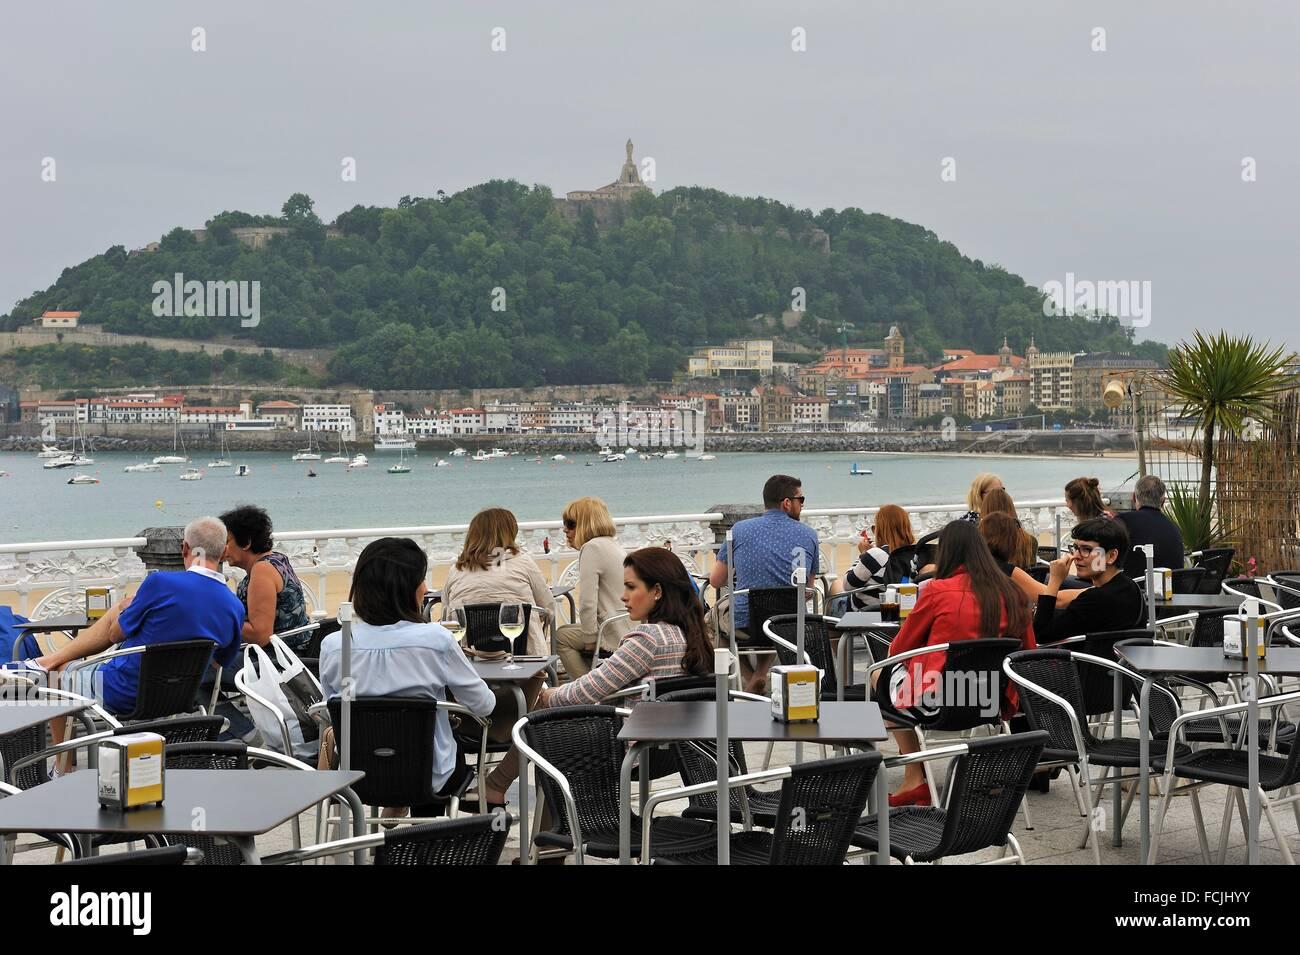 Generacion Bebida cuero  Cafe La Perla High Resolution Stock Photography and Images - Alamy